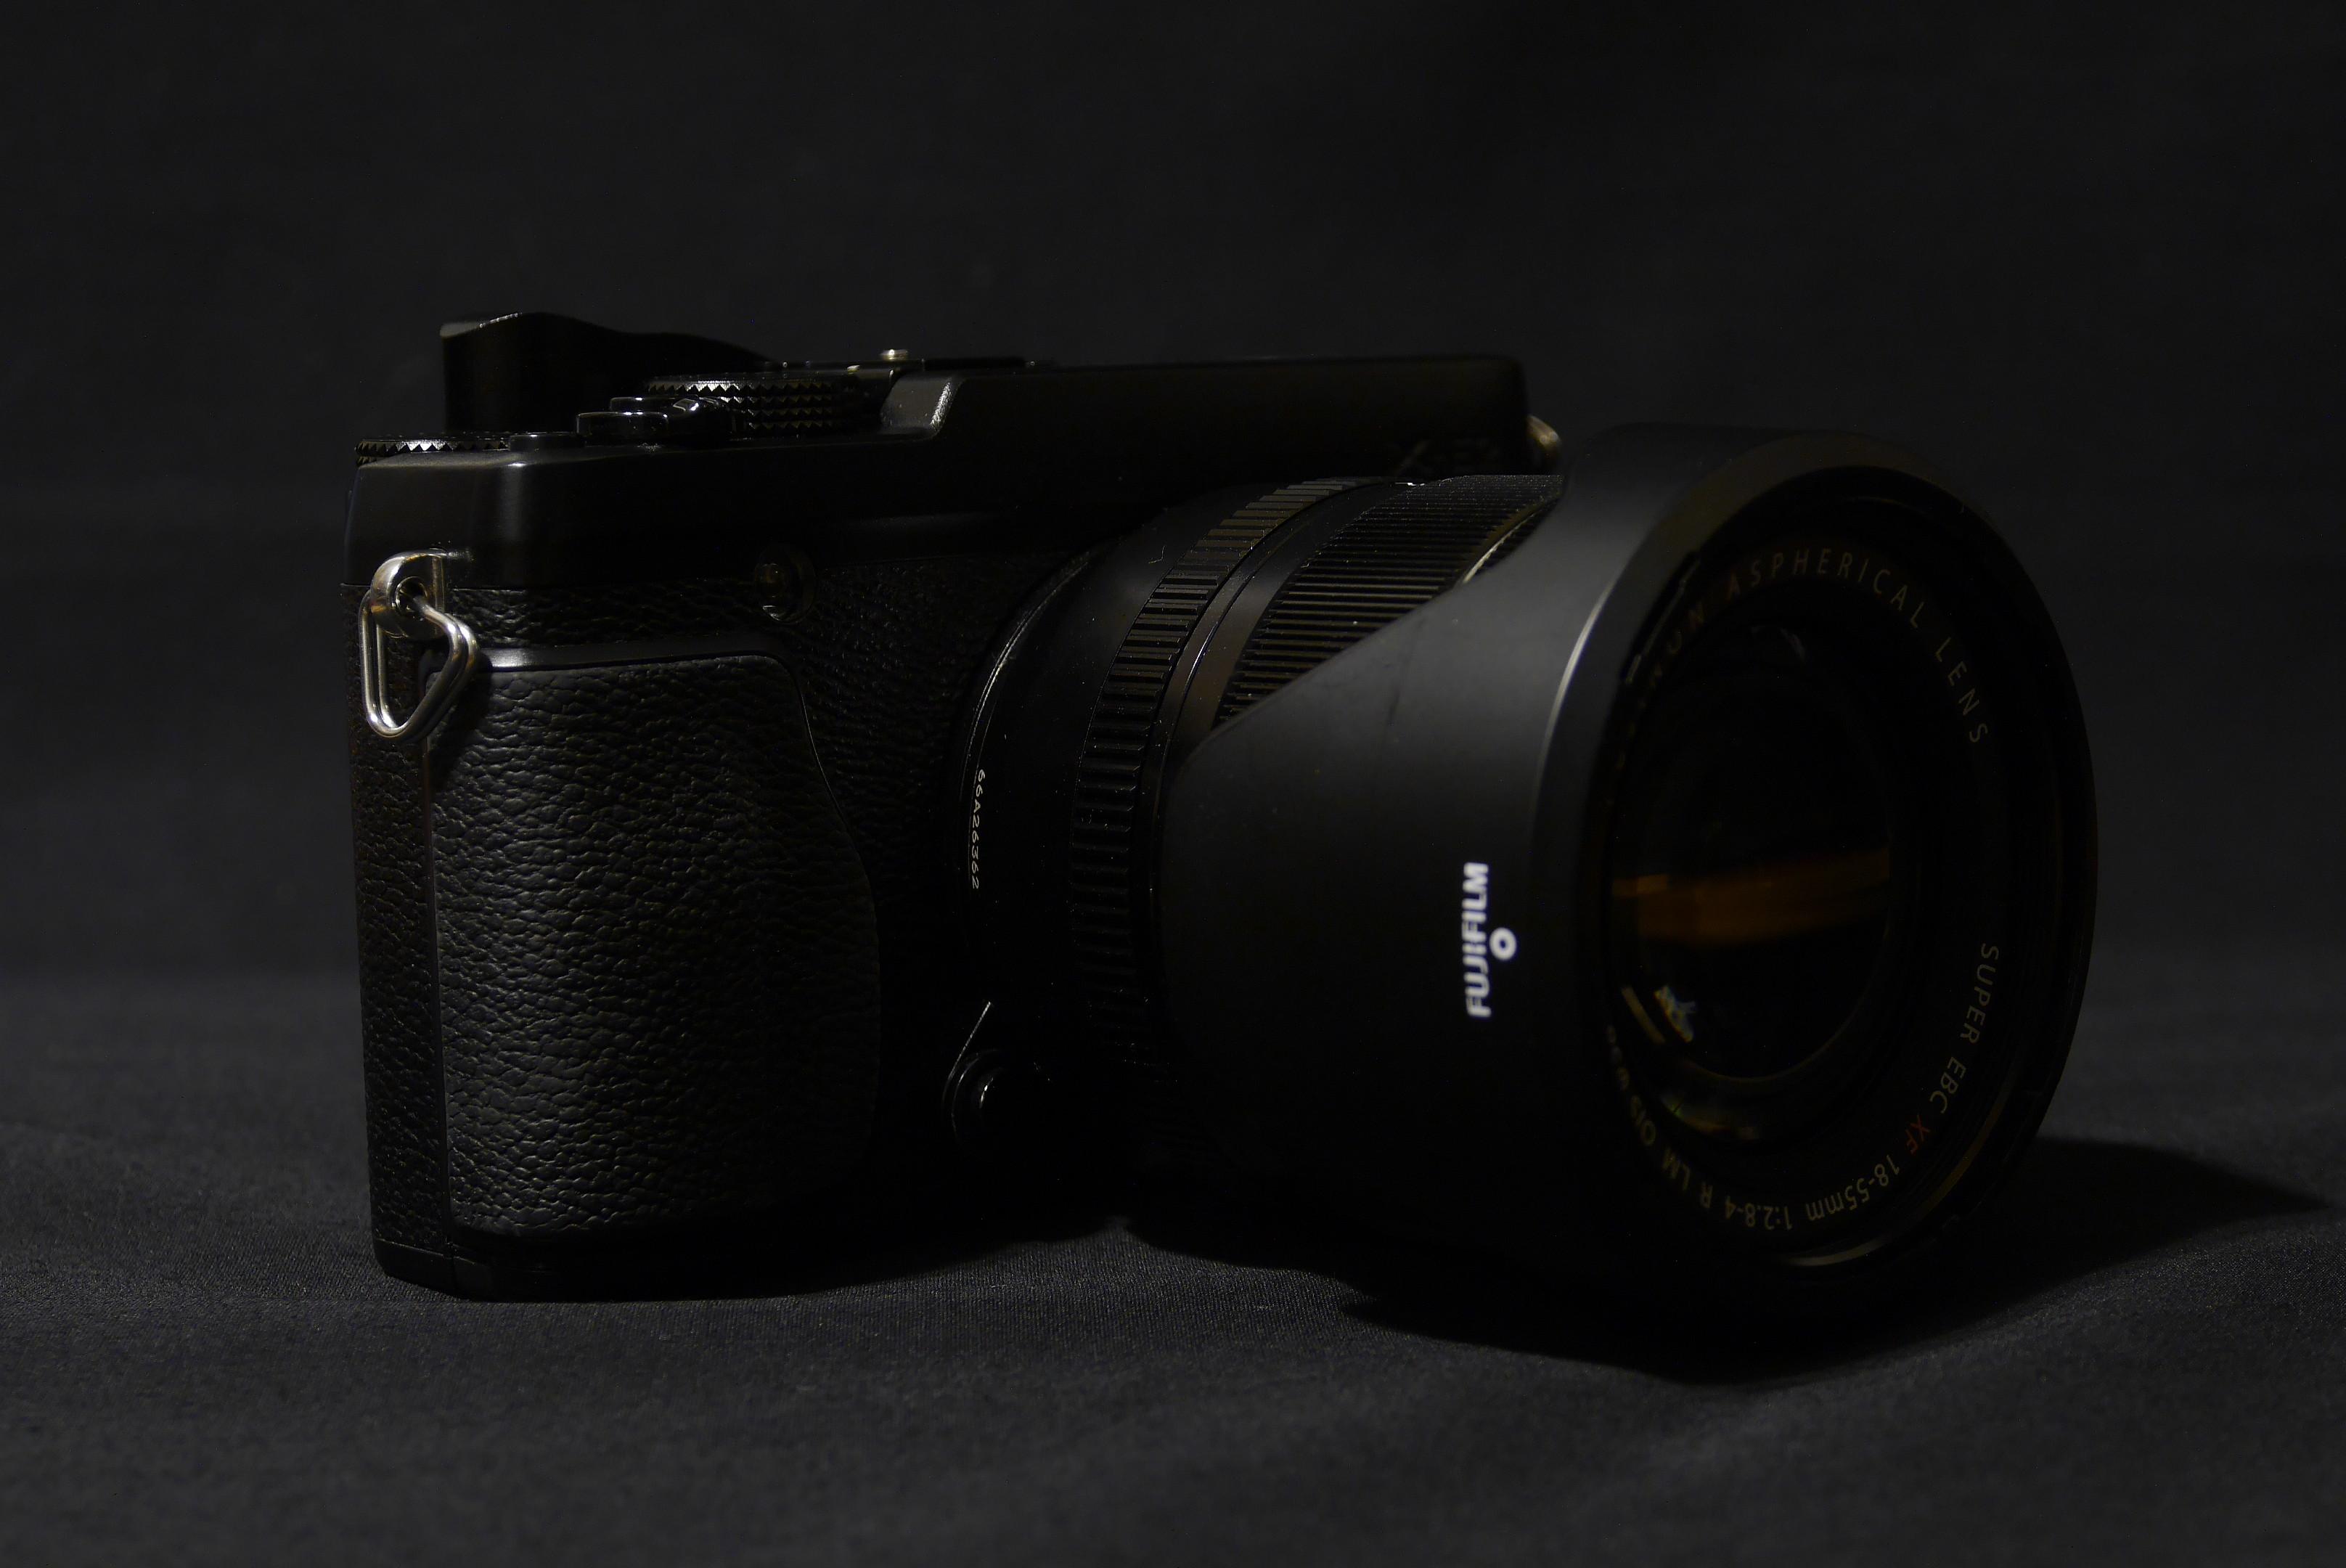 XーE2とxf18-55mm